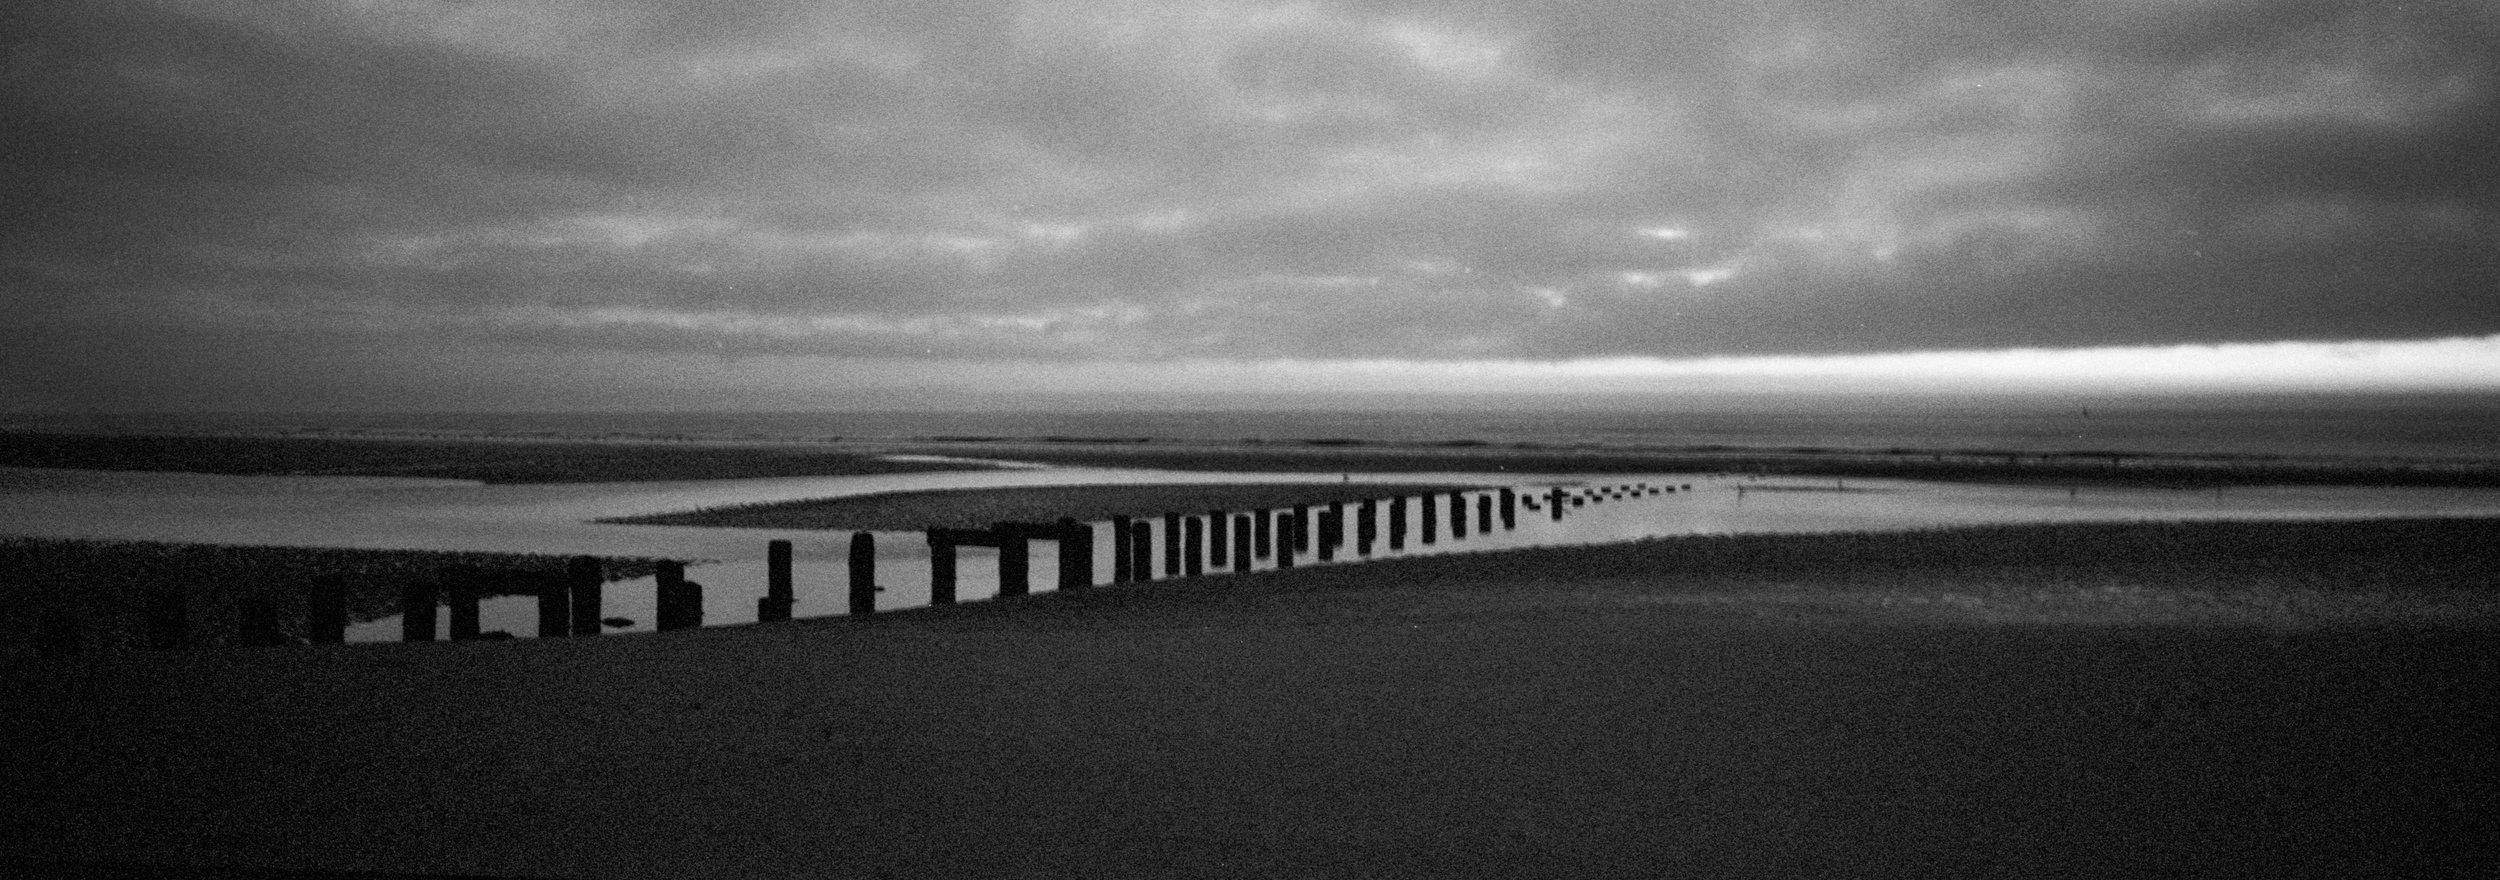 Landscape photography-1.jpg